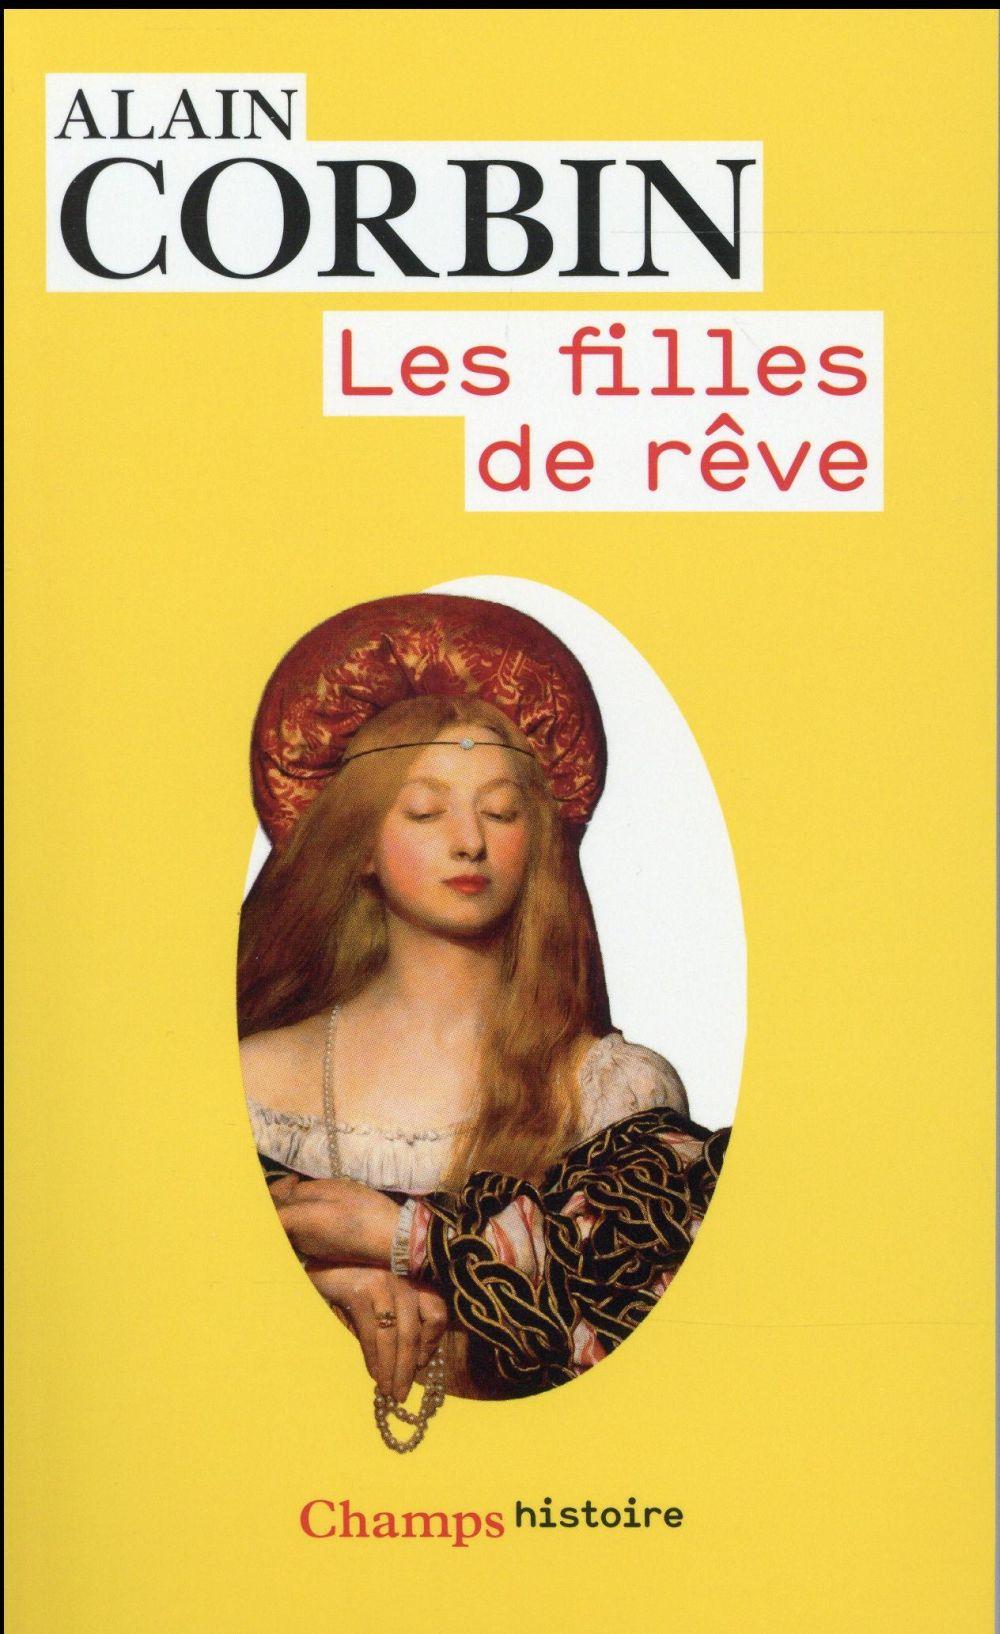 LES FILLES DE REVE